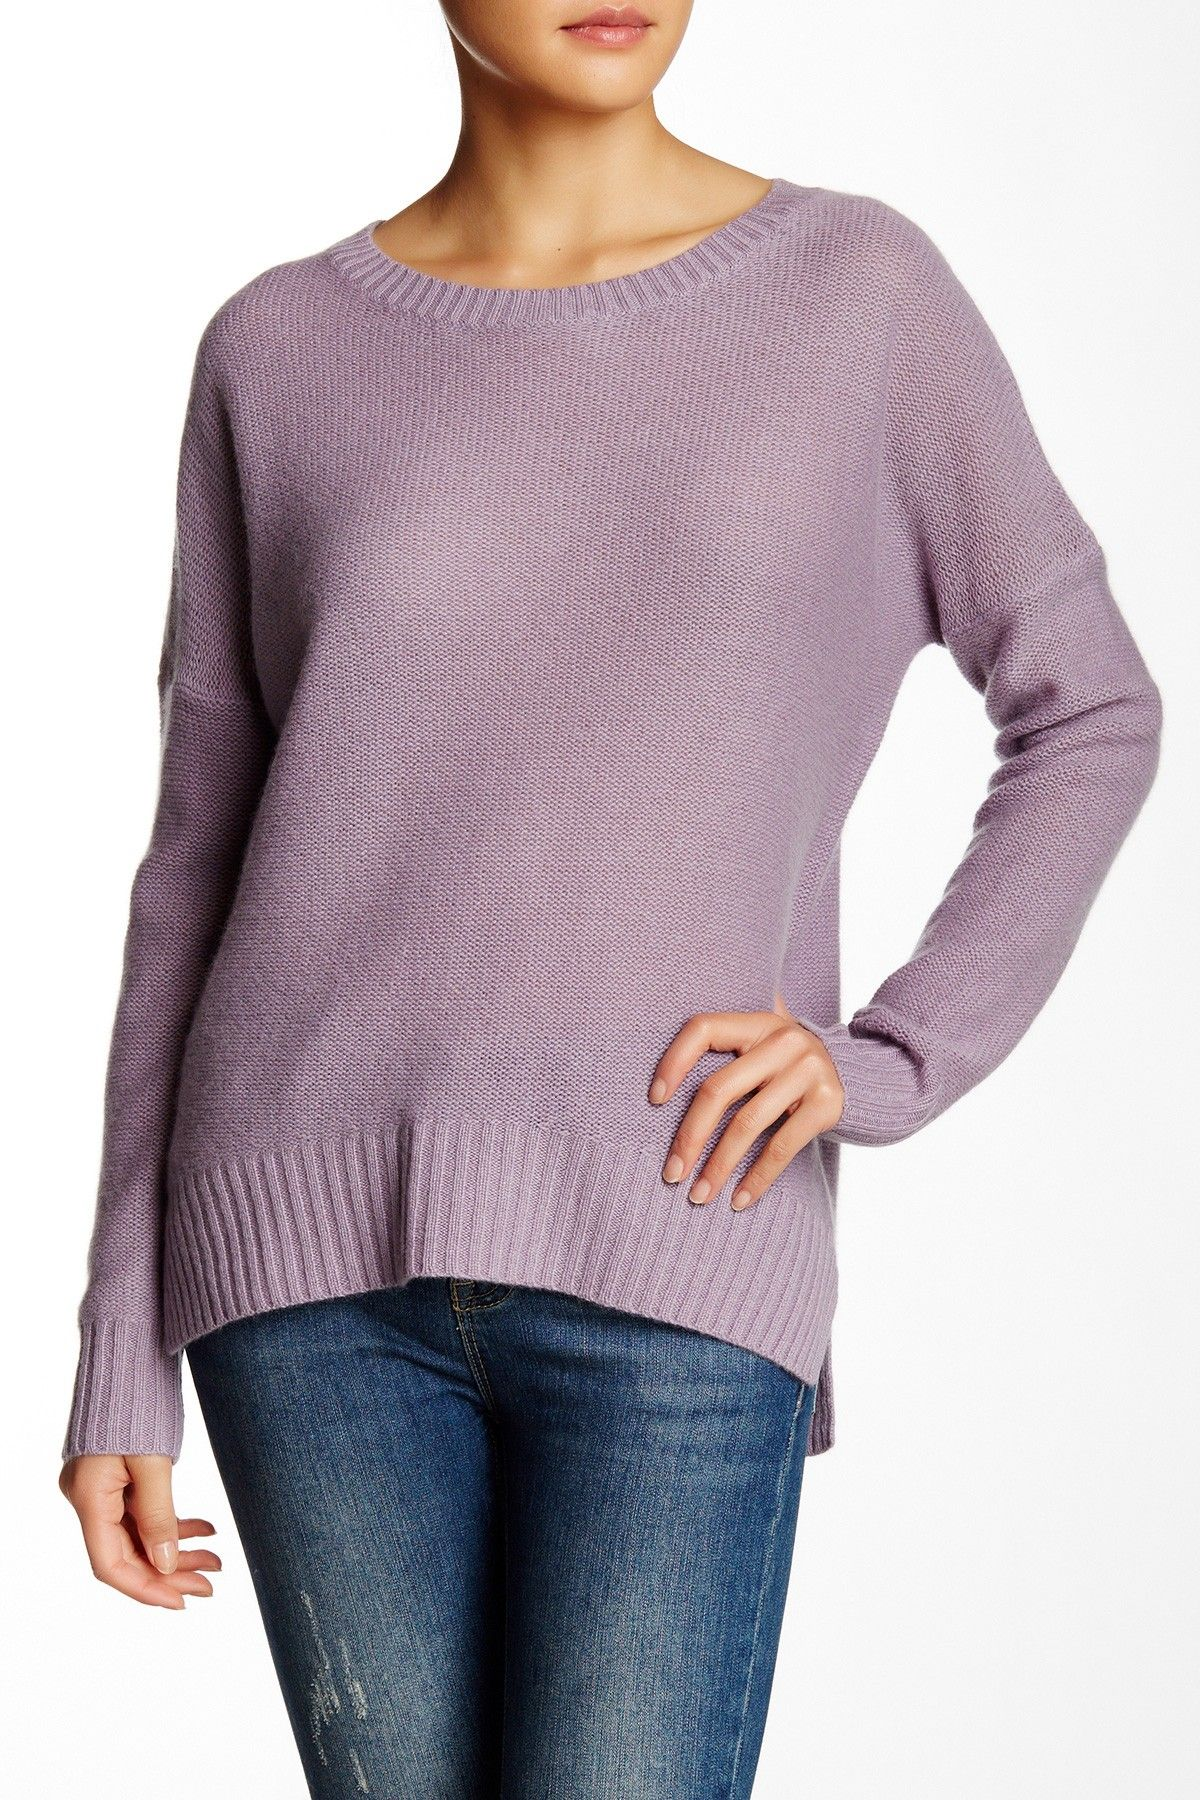 360 Cashmere | Dewey Cashmere Sweater | Cashmere sweaters ...